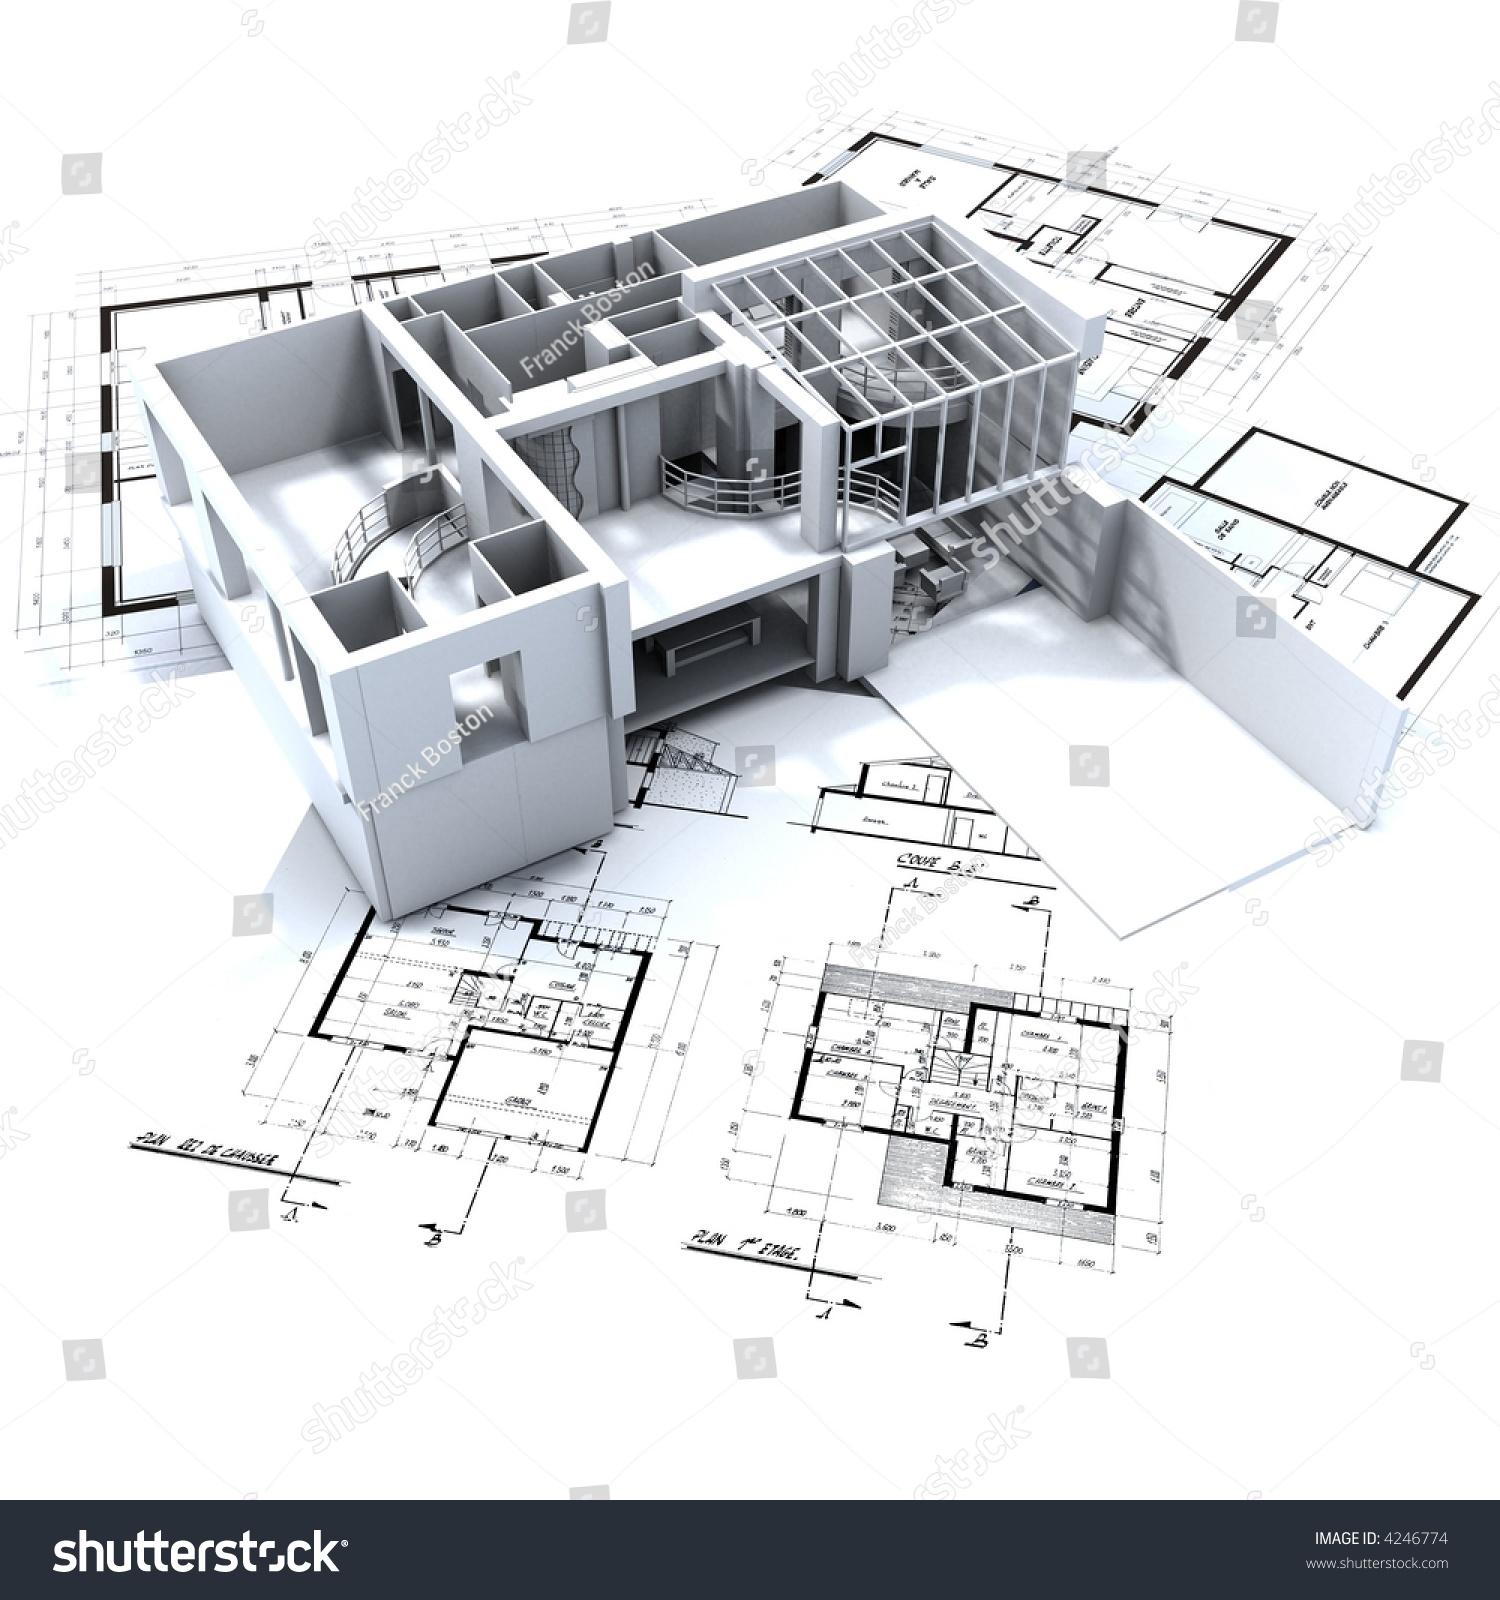 Architecture Blueprints loft mockup on top architecture blueprints stock photo 4246774